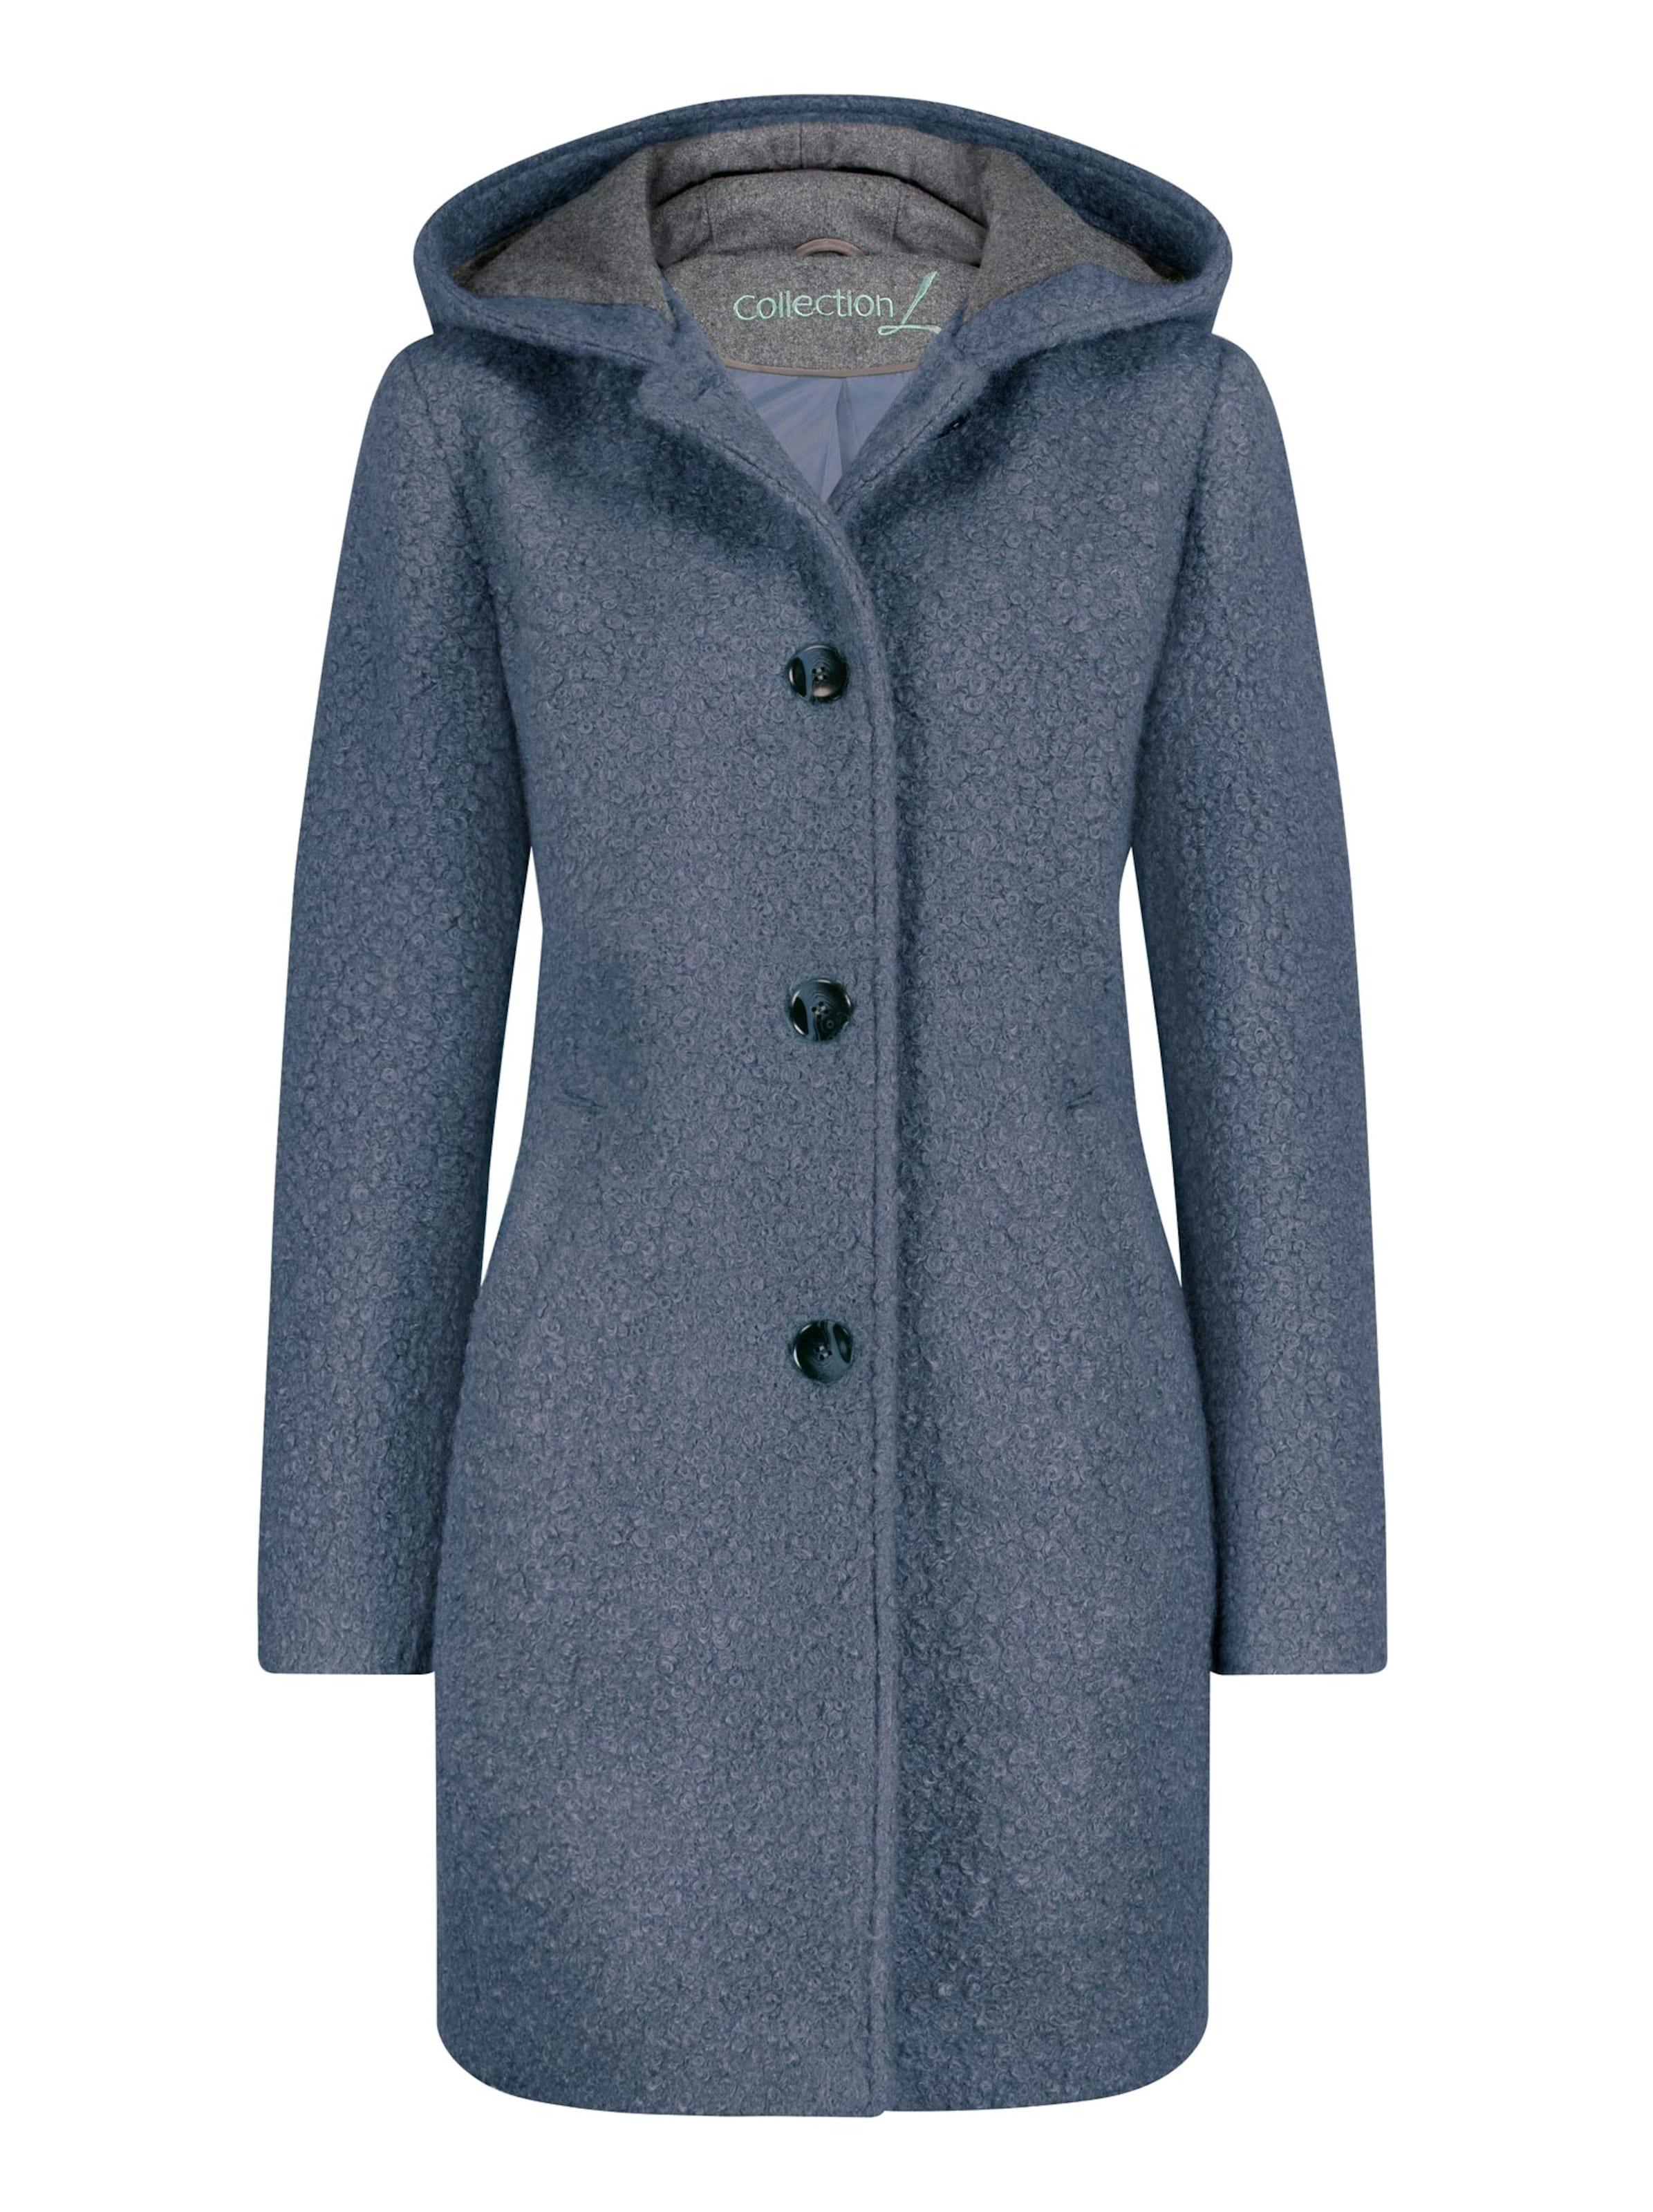 witt weiden -  Damen Jacke rauchblau-grau